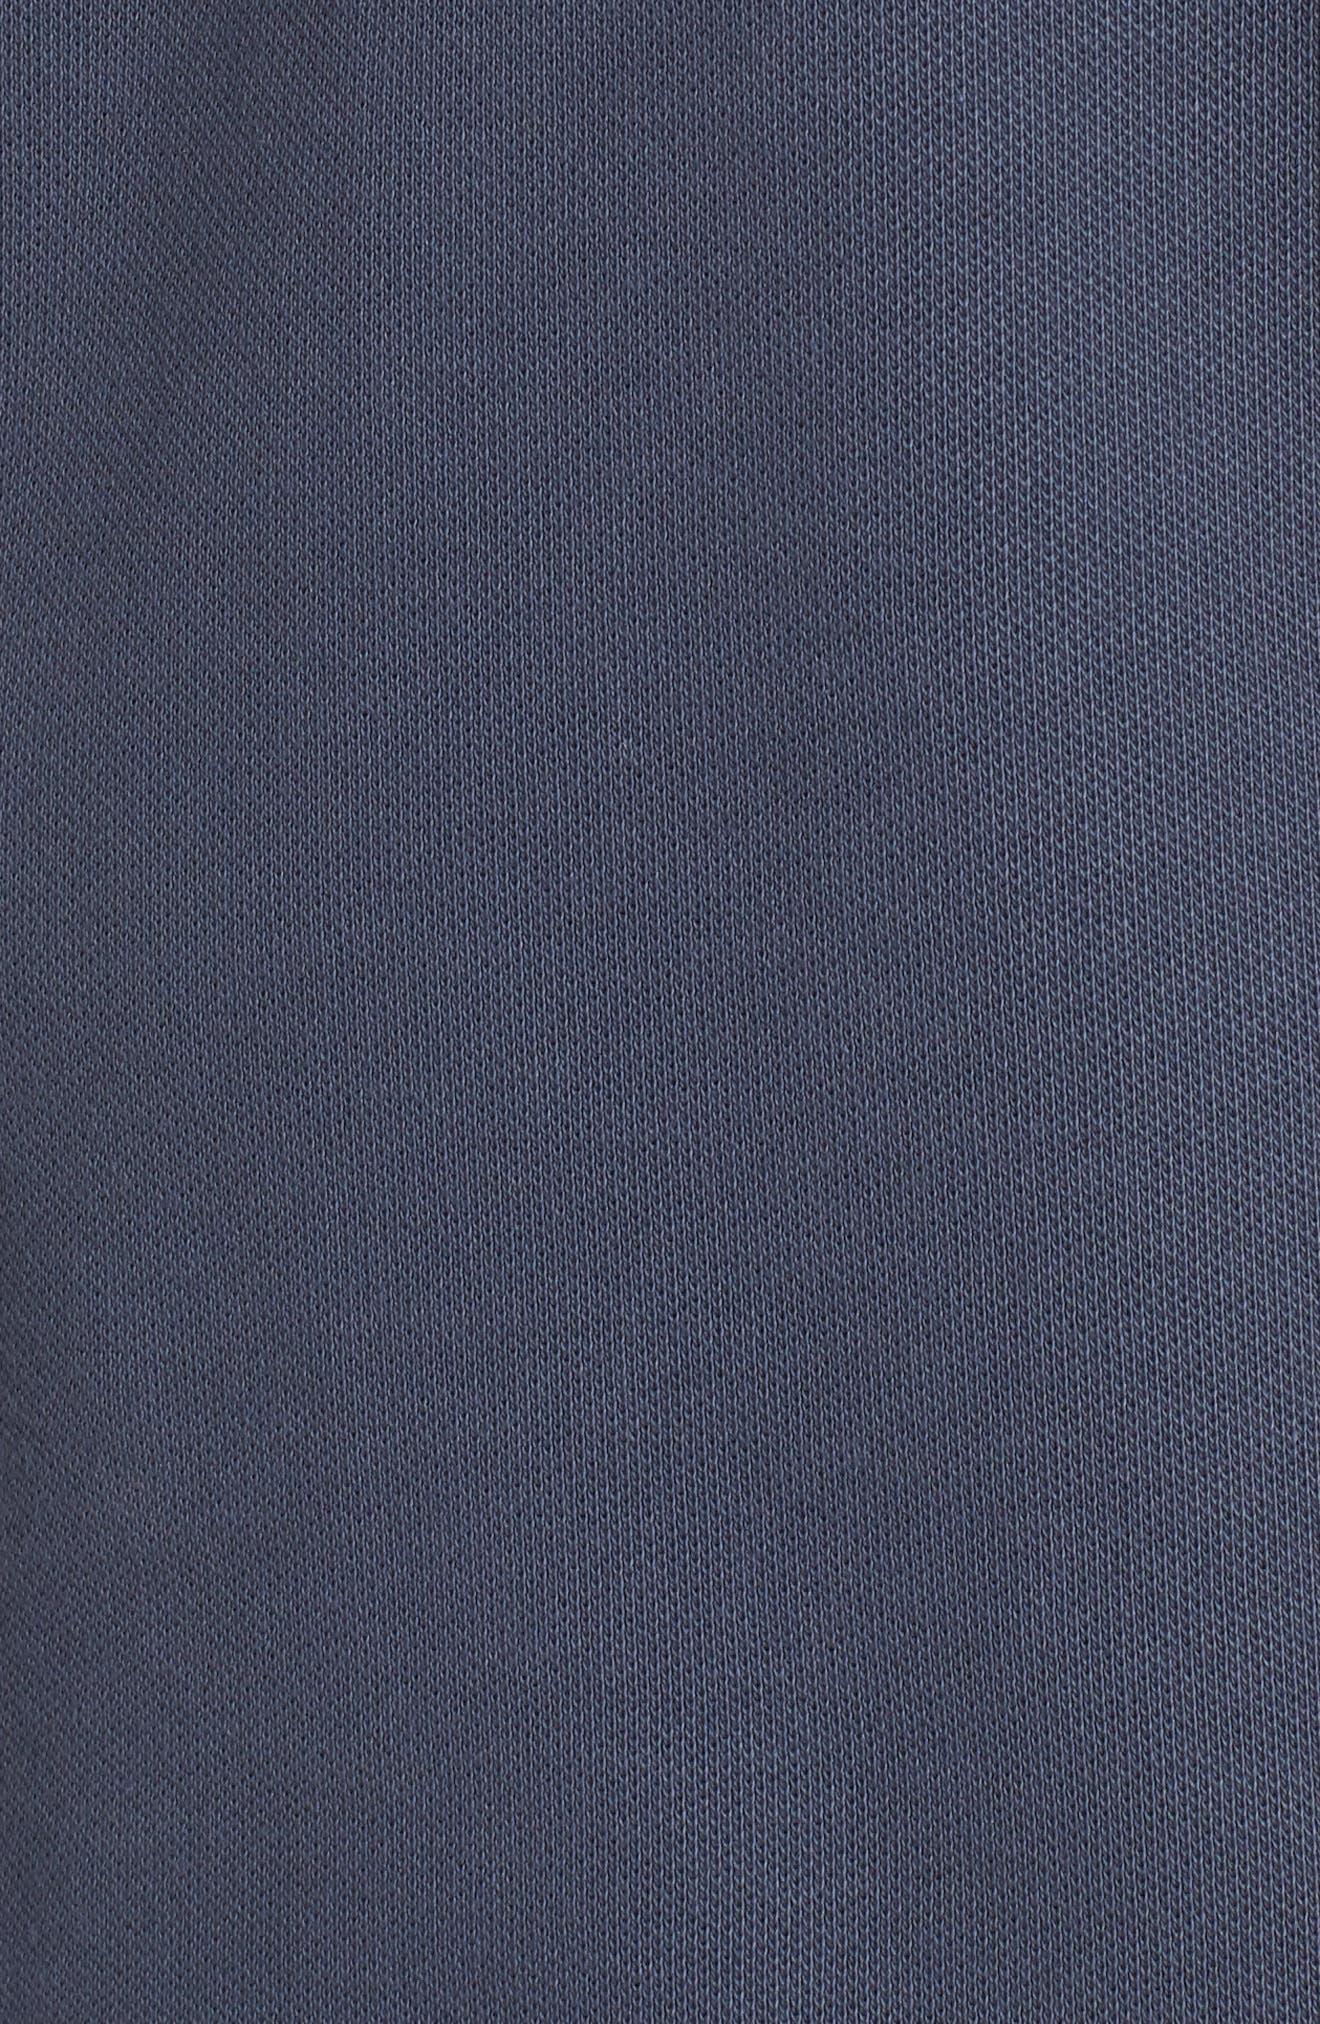 Nike Dry SB Rugby Polo,                             Alternate thumbnail 5, color,                             Thunder Blue/ White